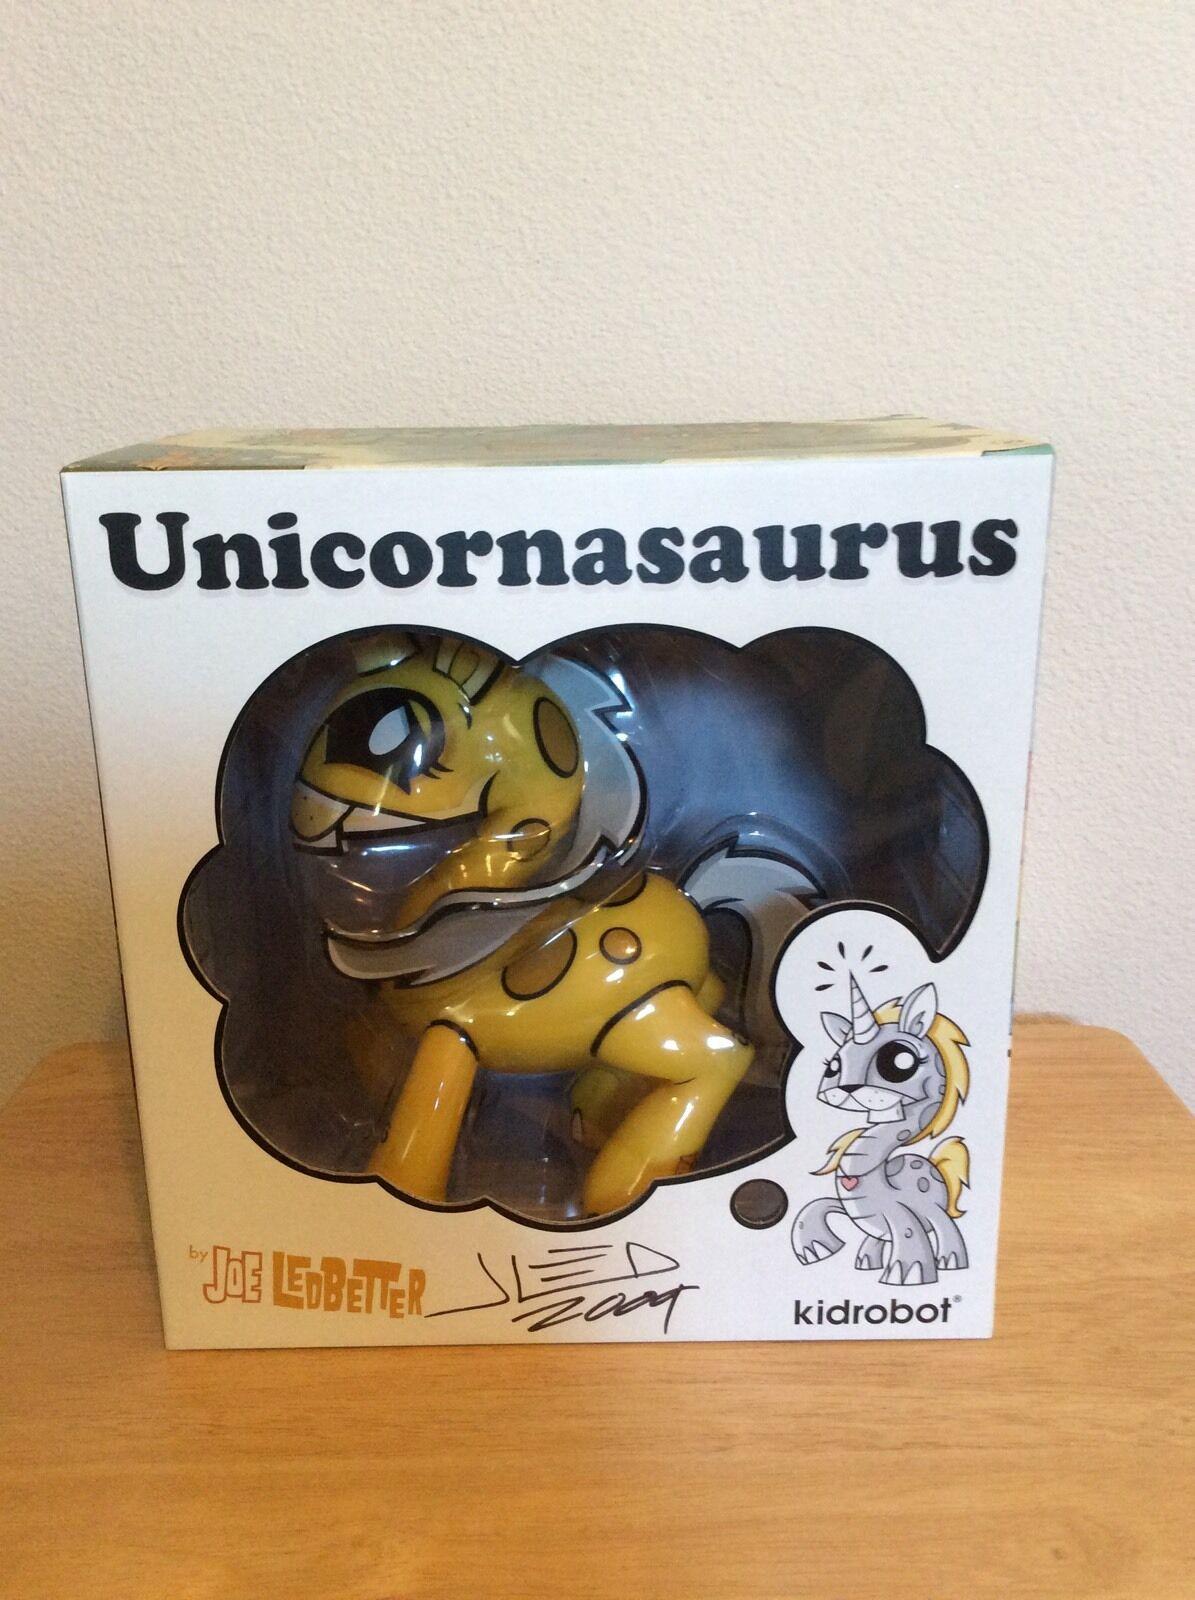 SIGNED - Joe Ledbetter Yellow Unicornasaurus Kidrobot Vinyl 8  Figure + Photo